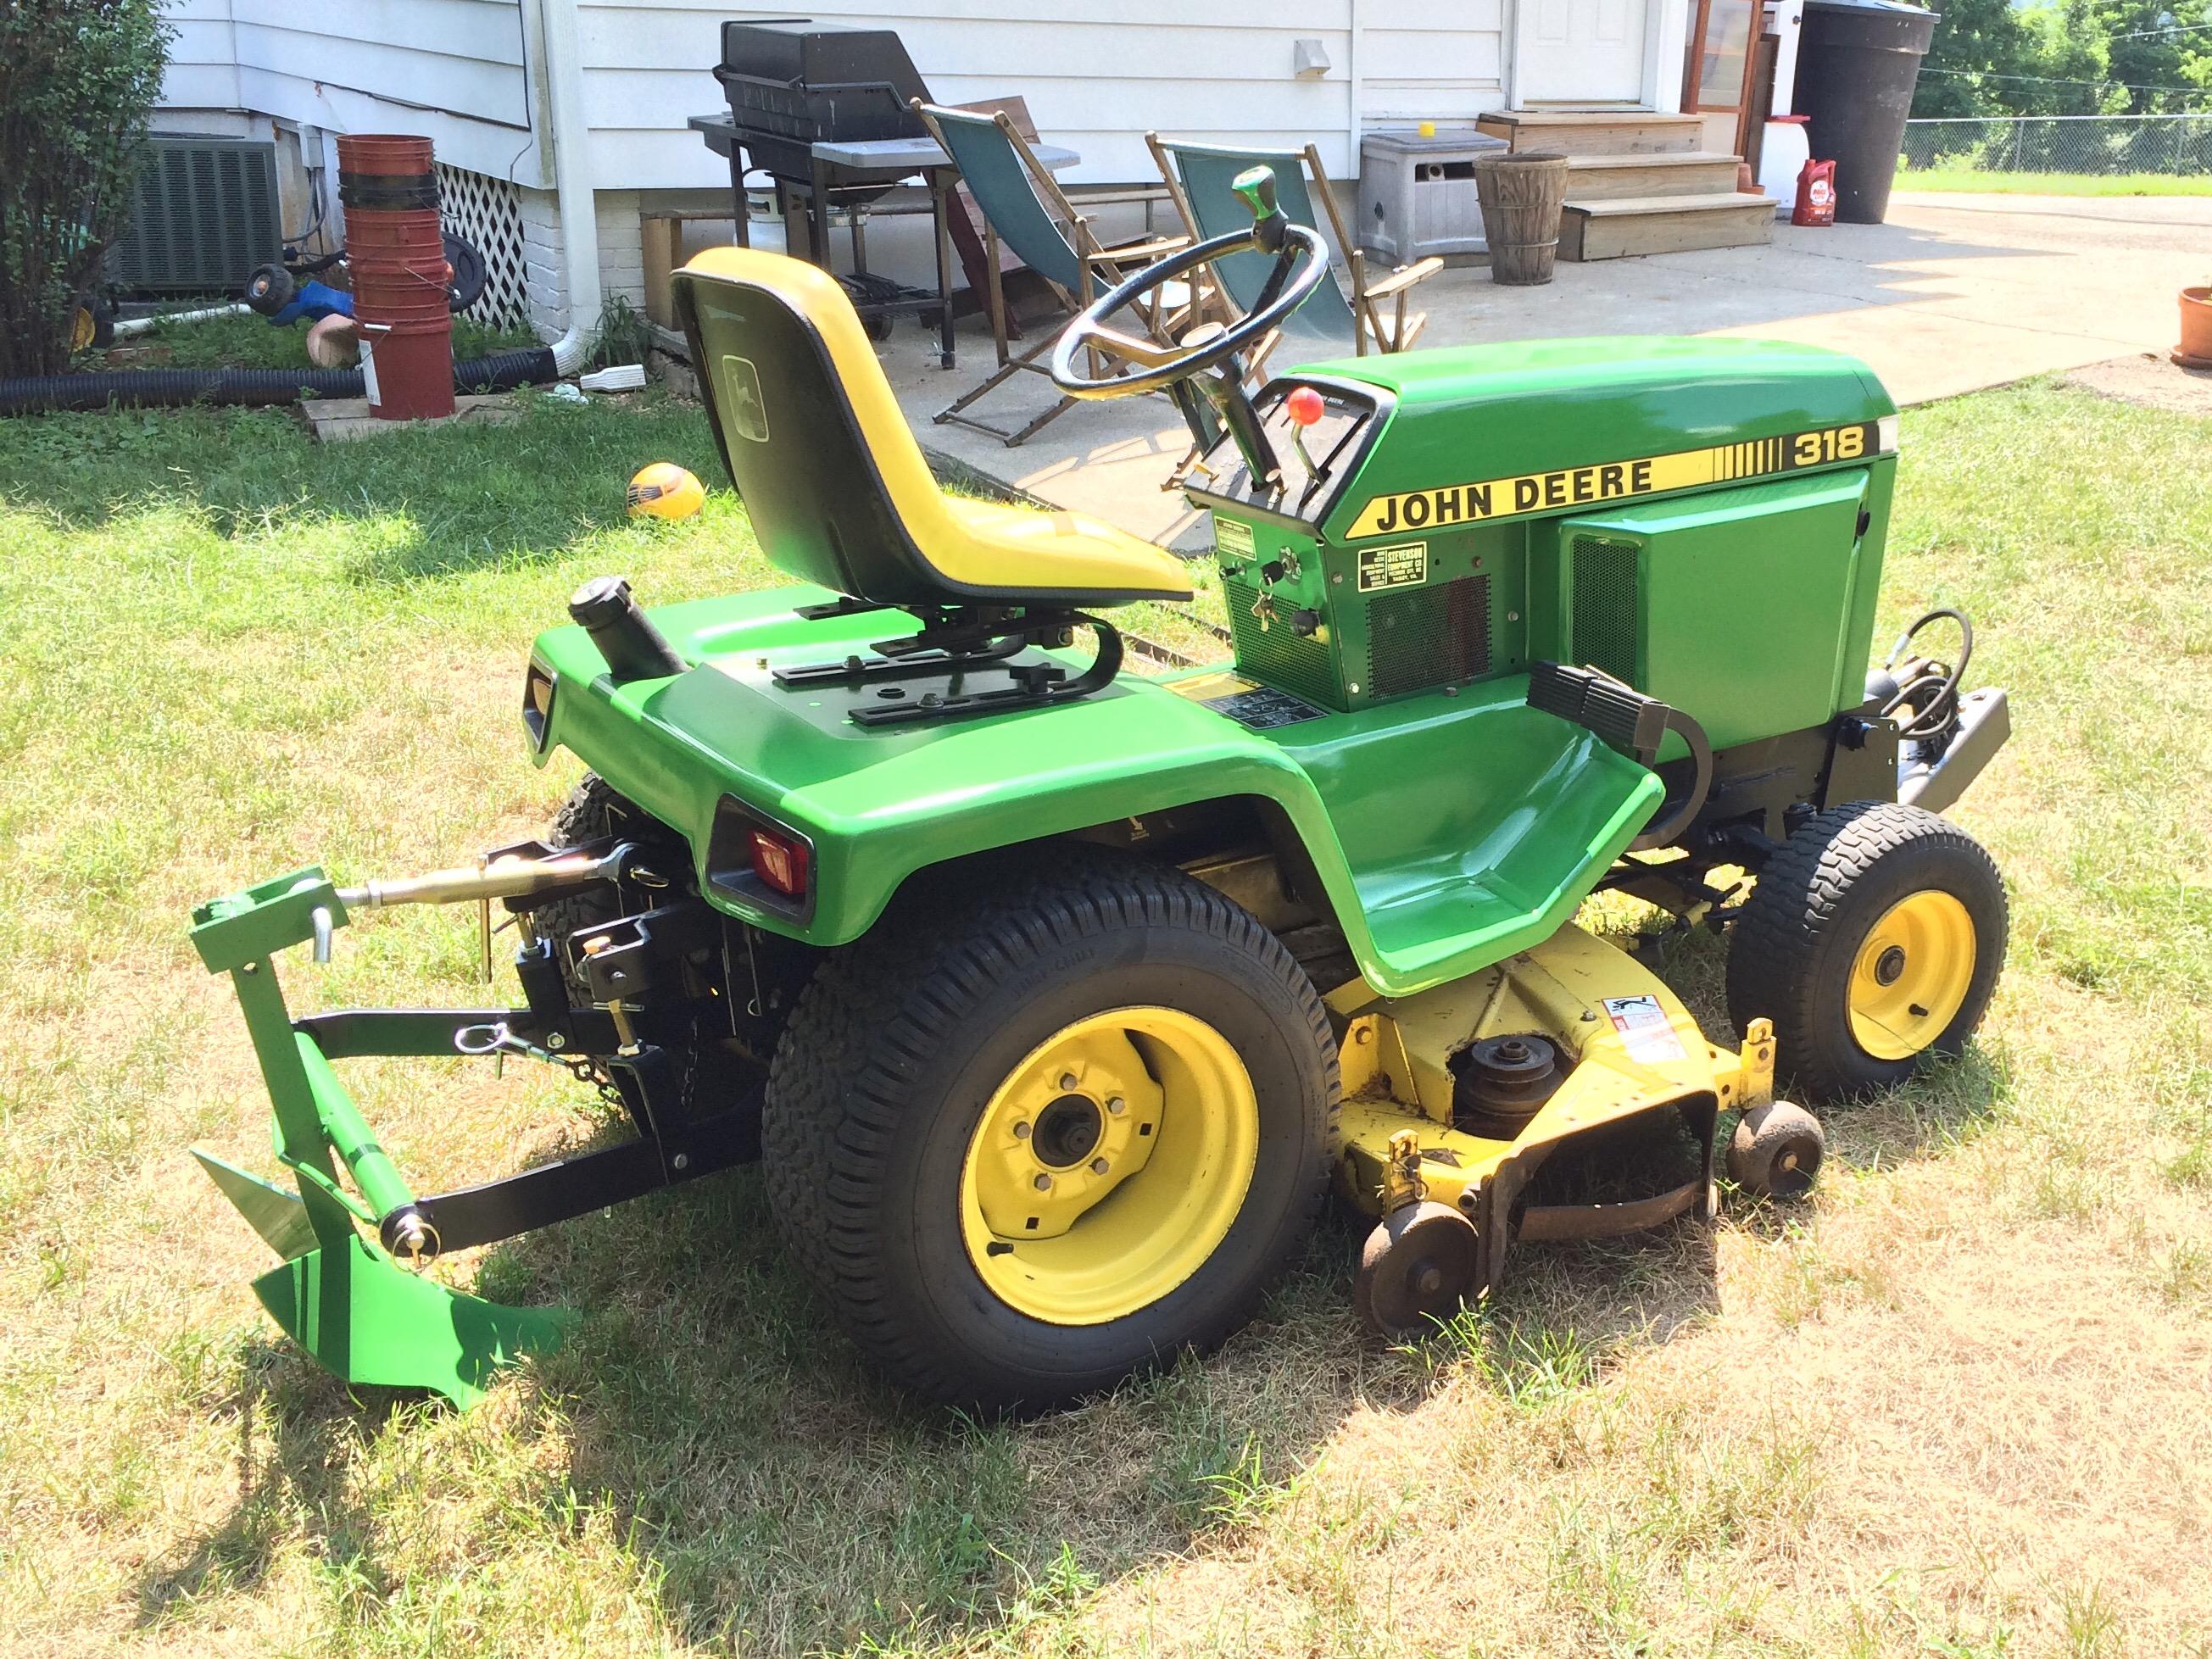 John Deere 318 Potato Plow | John Deere | Pinterest | John ...